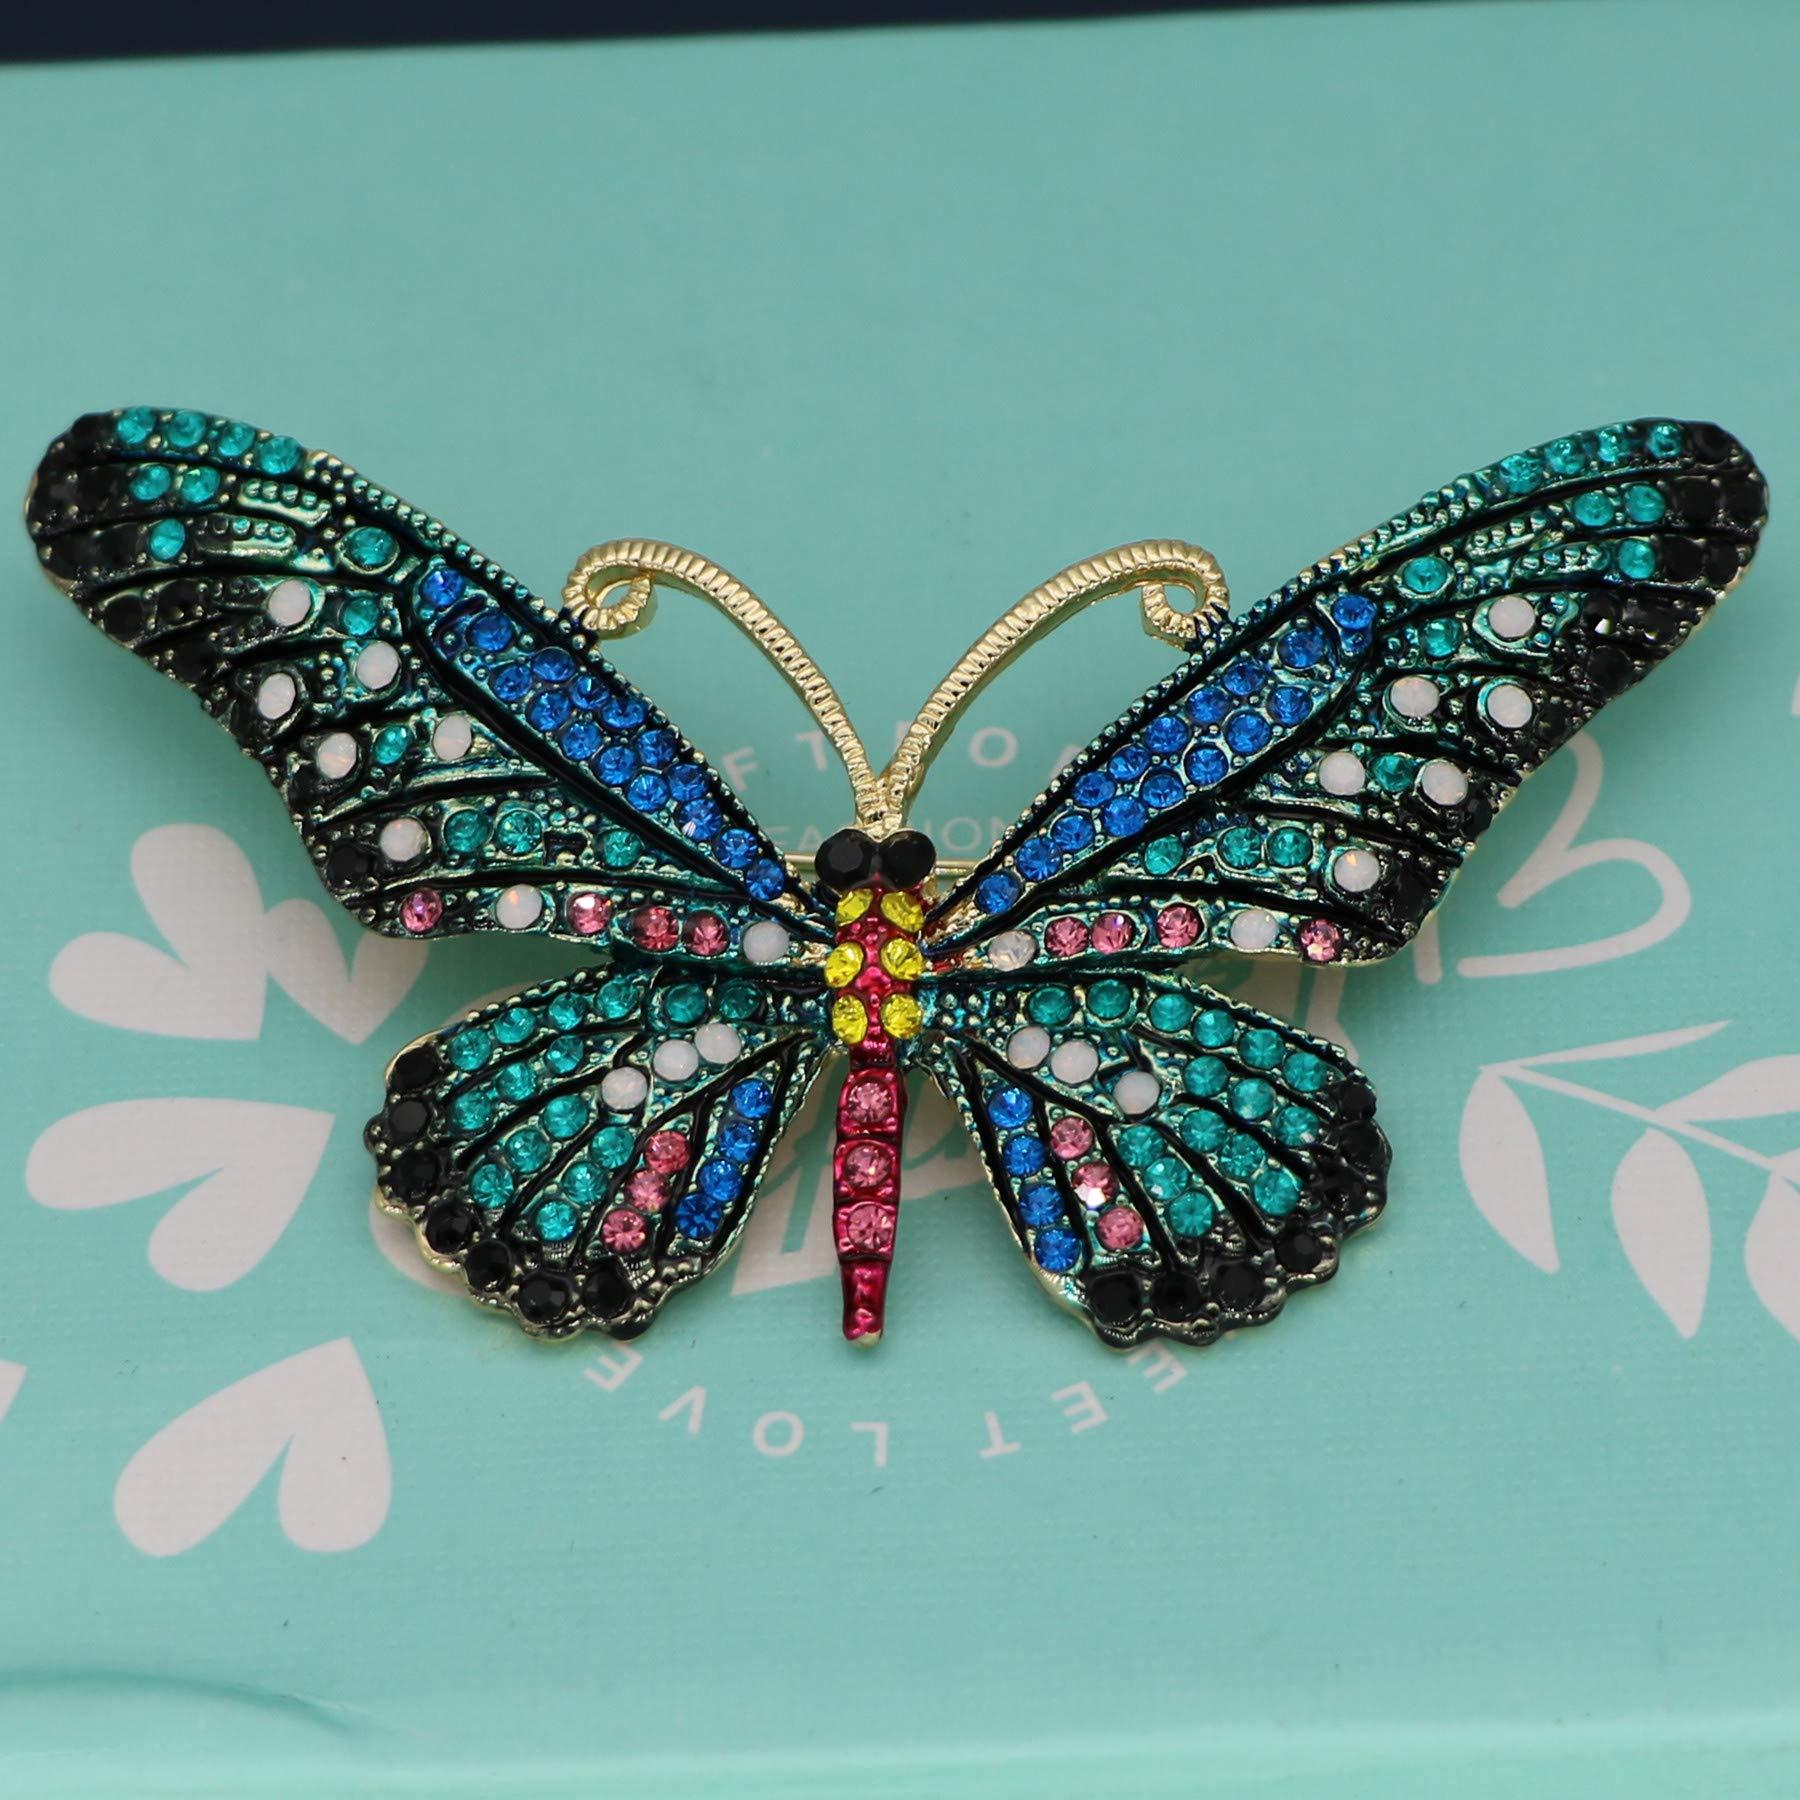 Mondora Prom Brooch Pin Animal Buttwefly Enamel Women's Austrian Crystal Gold-Tone Blue by Mondora (Image #3)